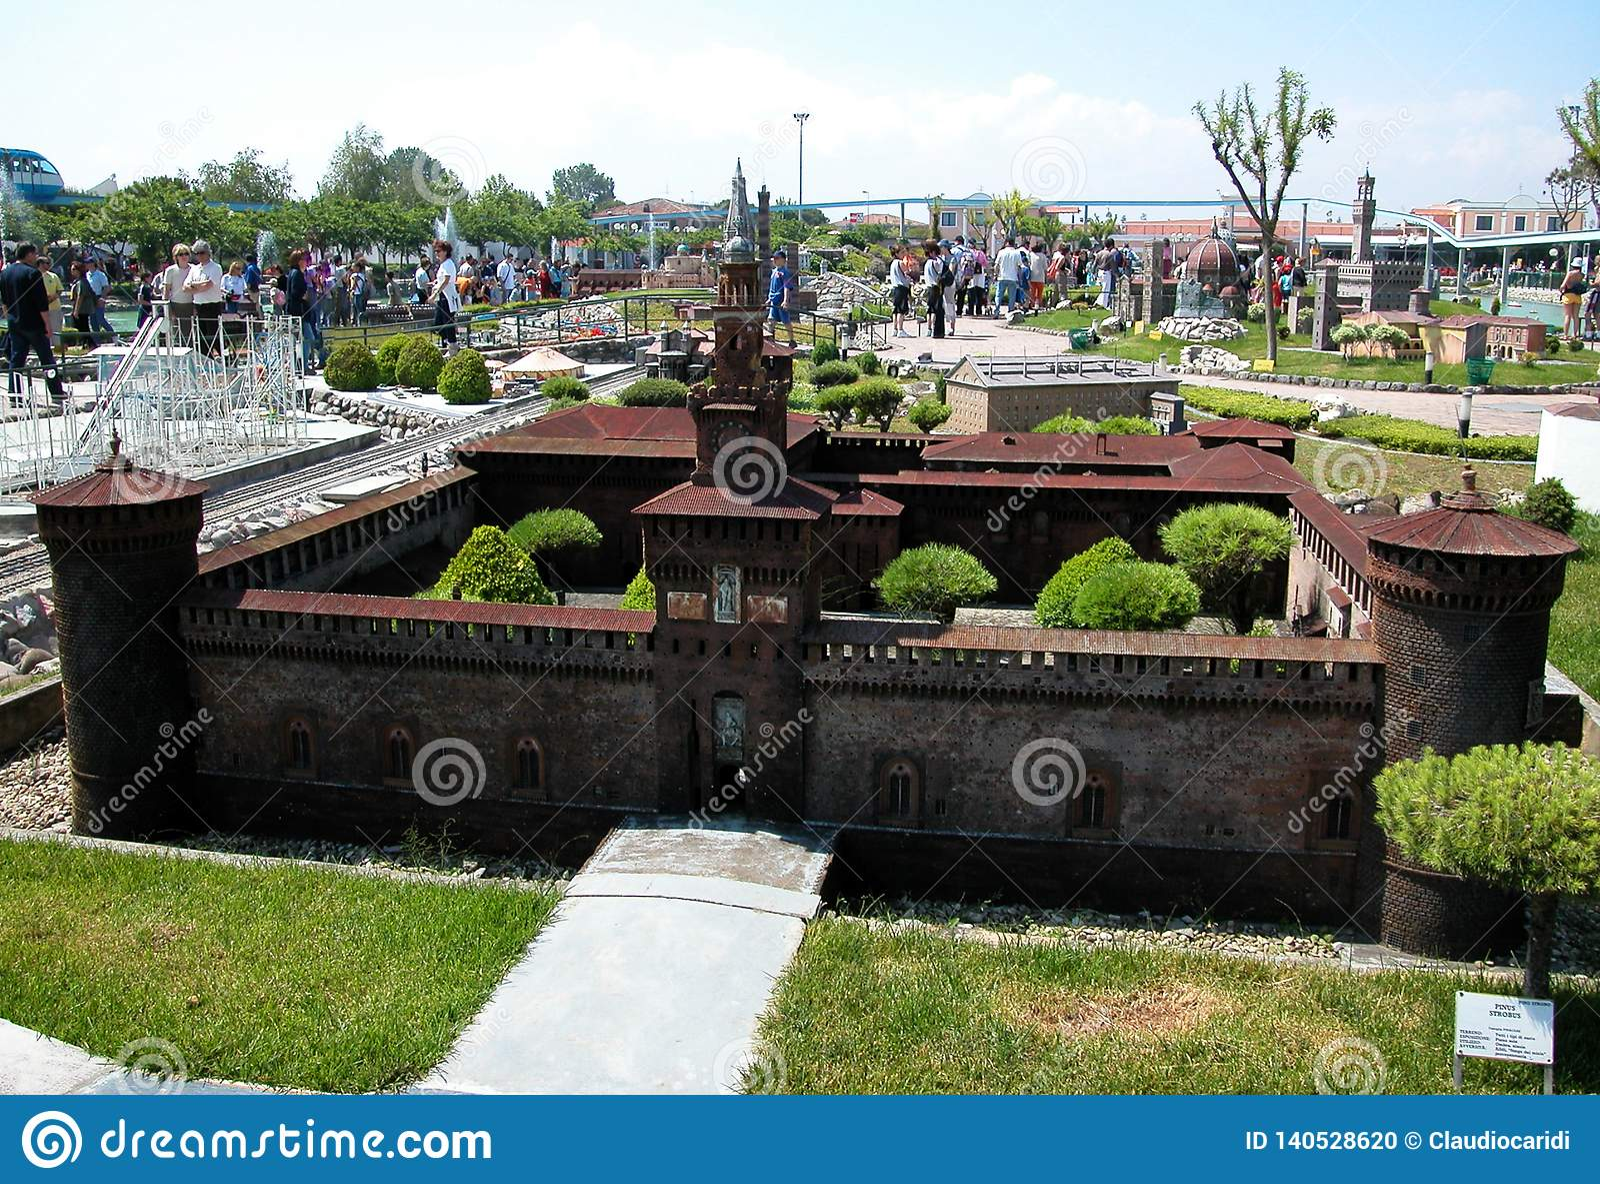 Fortress of Milan in the theme park `Italy in miniature` Italia in miniatura Viserba, Rimini, Italy